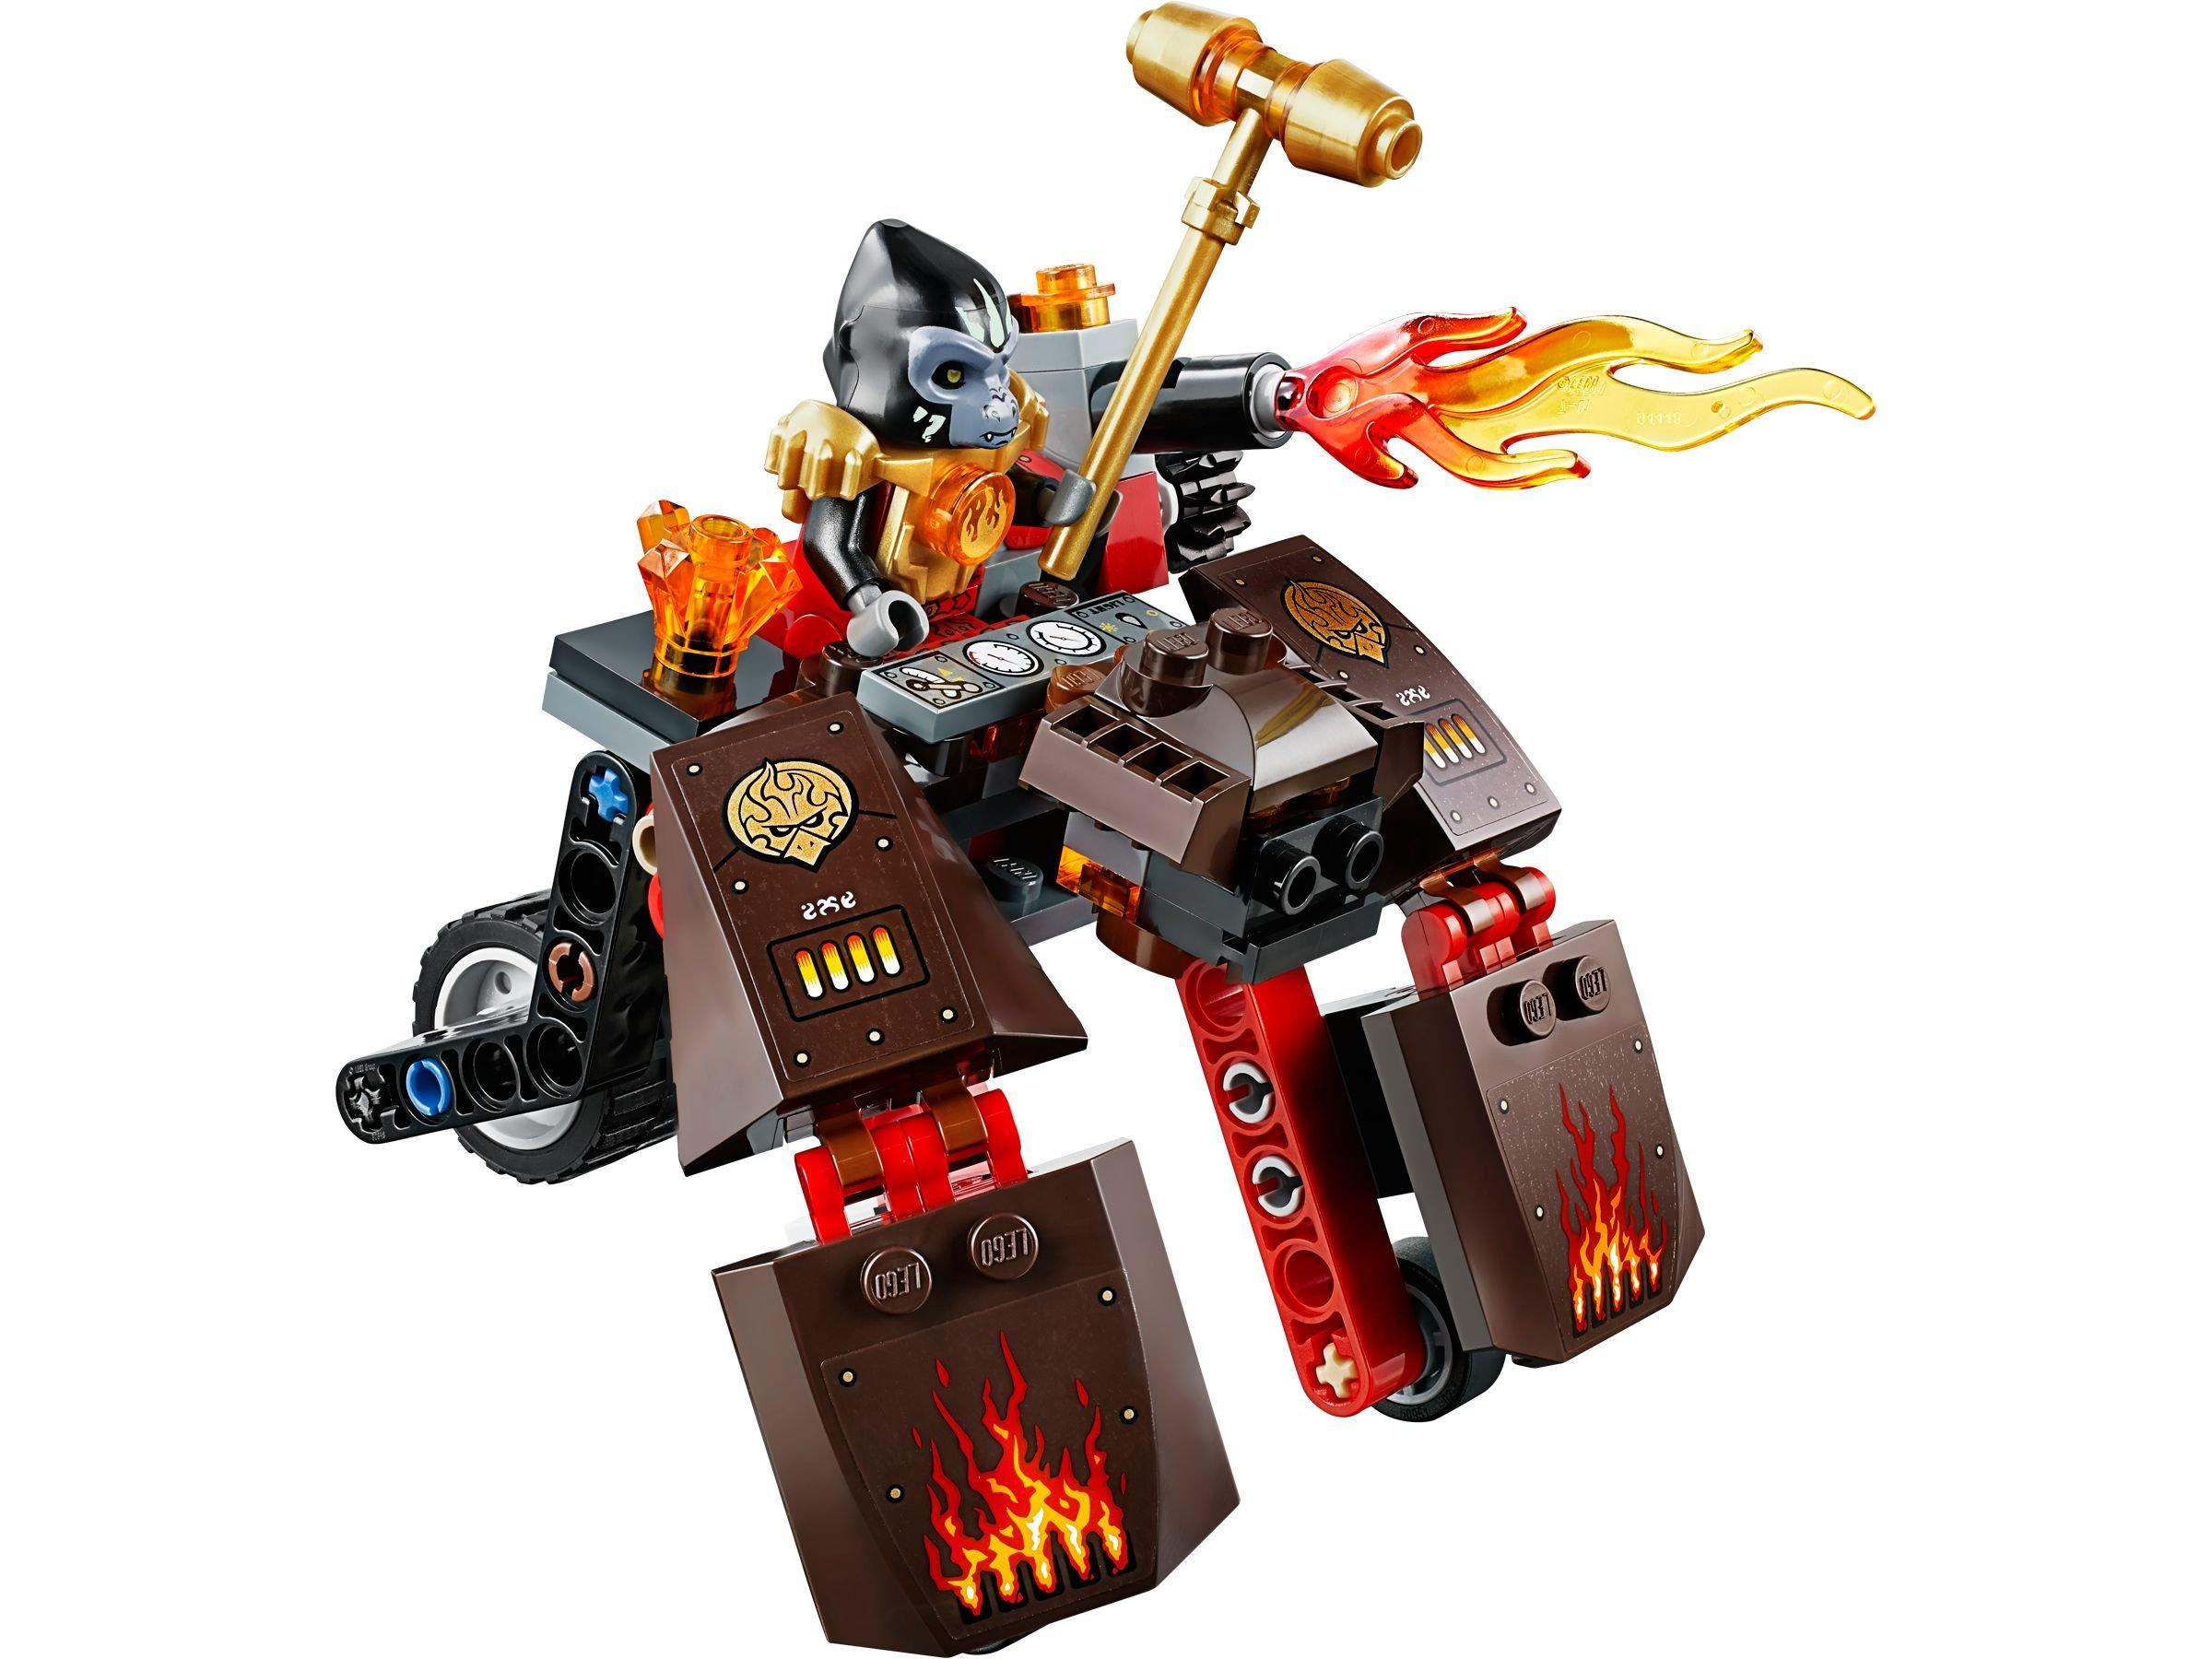 Lego 70147 sir fangars eisschloss legends of chima 2014 sir fangar 39 s ice fortress brickmerge - Image de lego chima ...